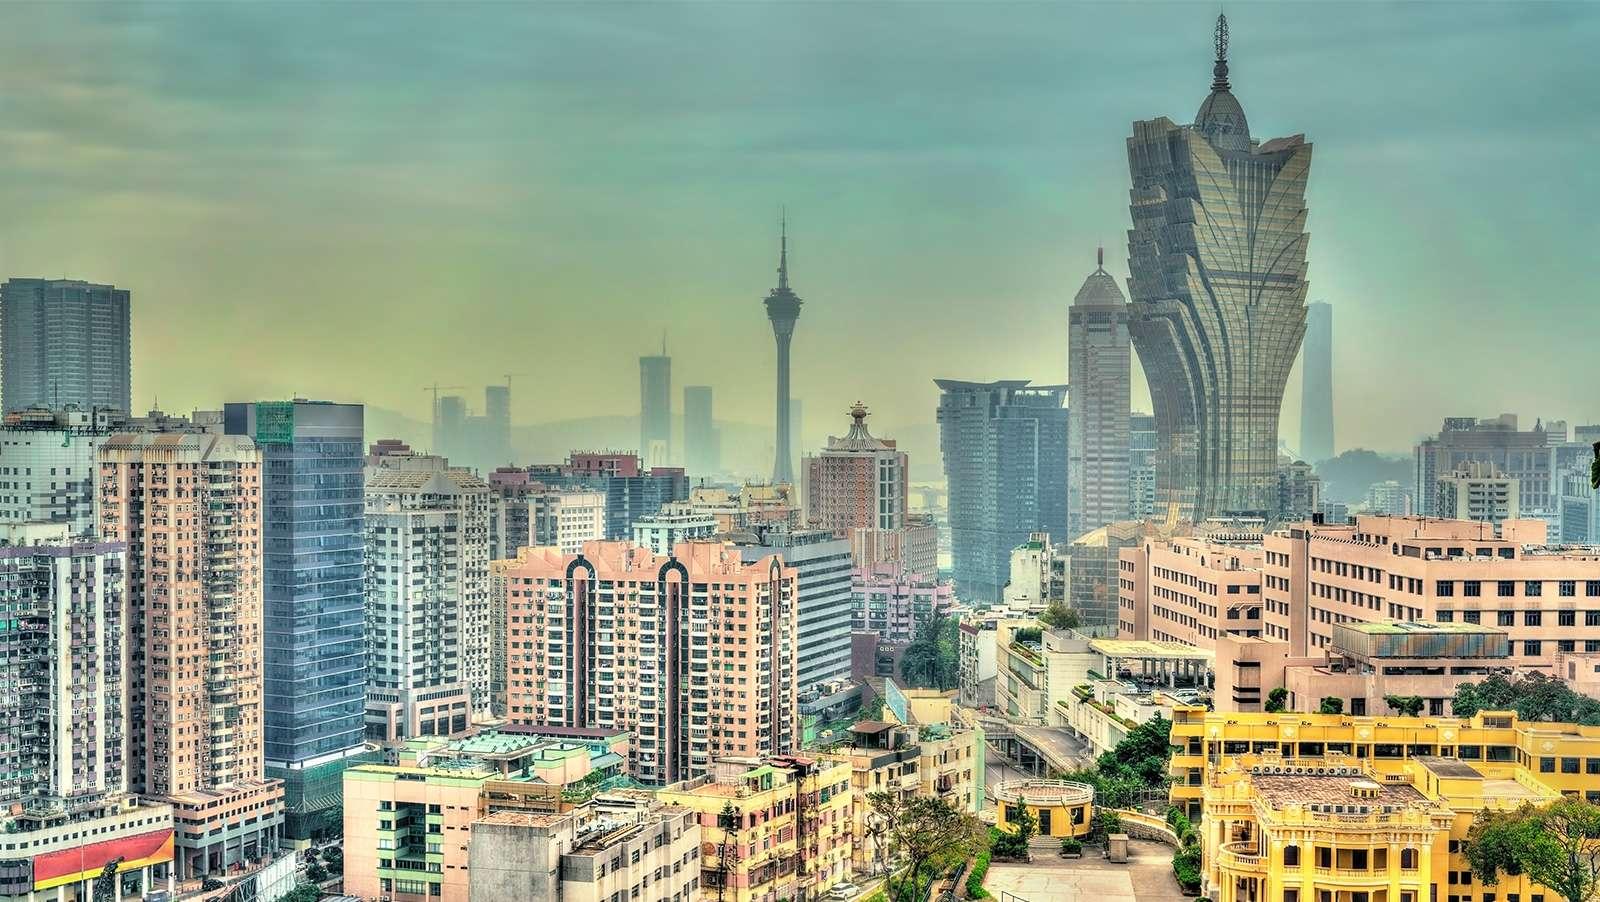 Macau casinos prepare as typhoon season approaches